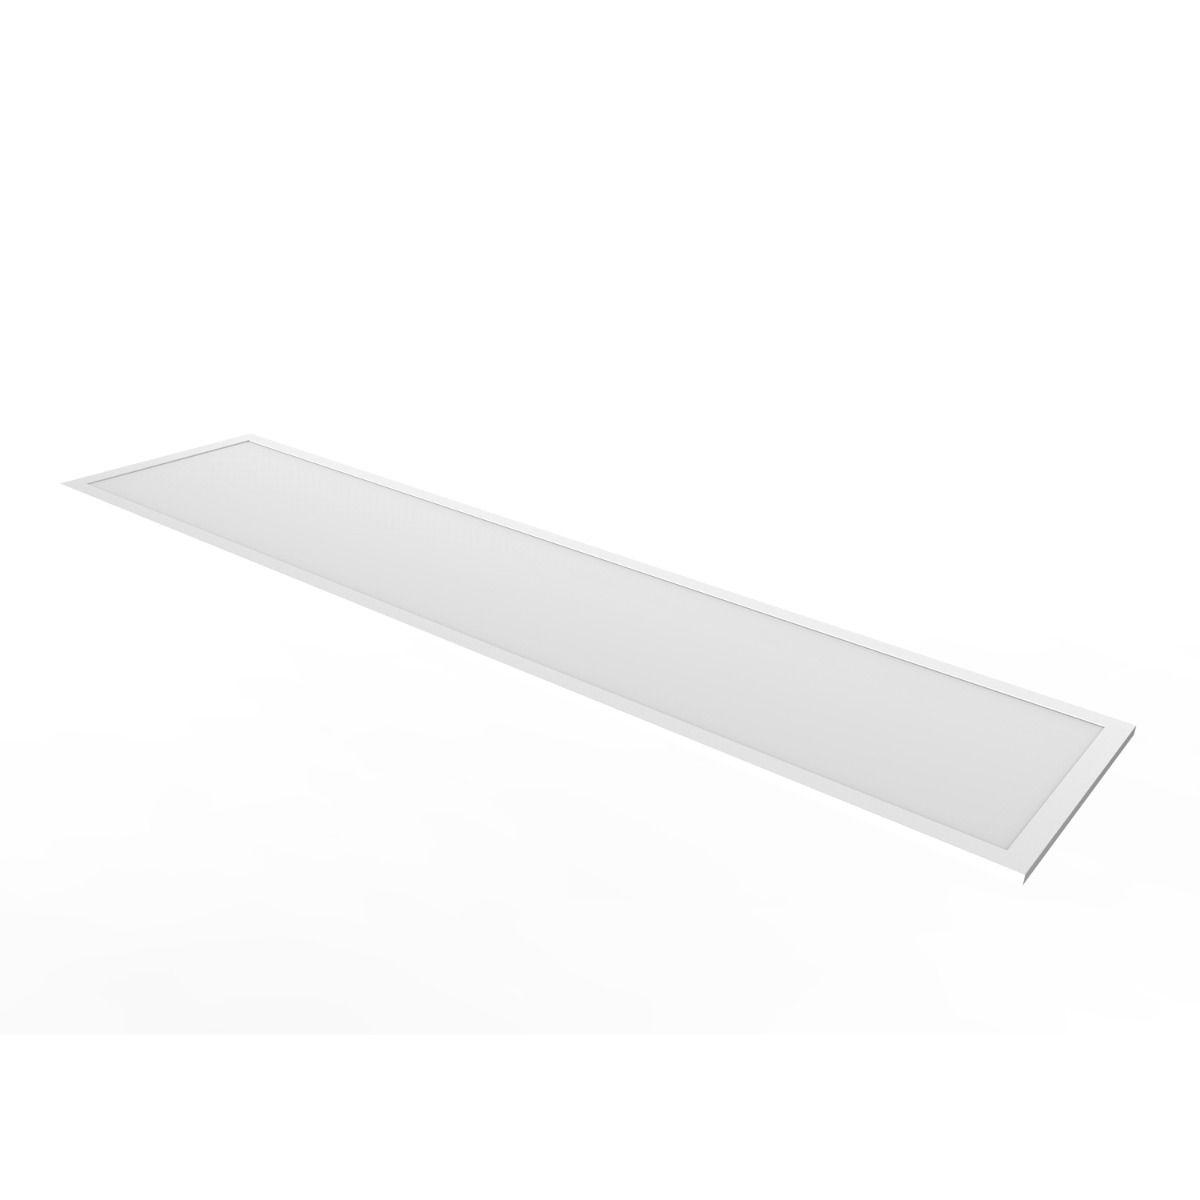 Noxion LED Panel Ecowhite V2.0 30x120cm 6500K 36W UGR <19 | Daylight - Replaces 2x36W